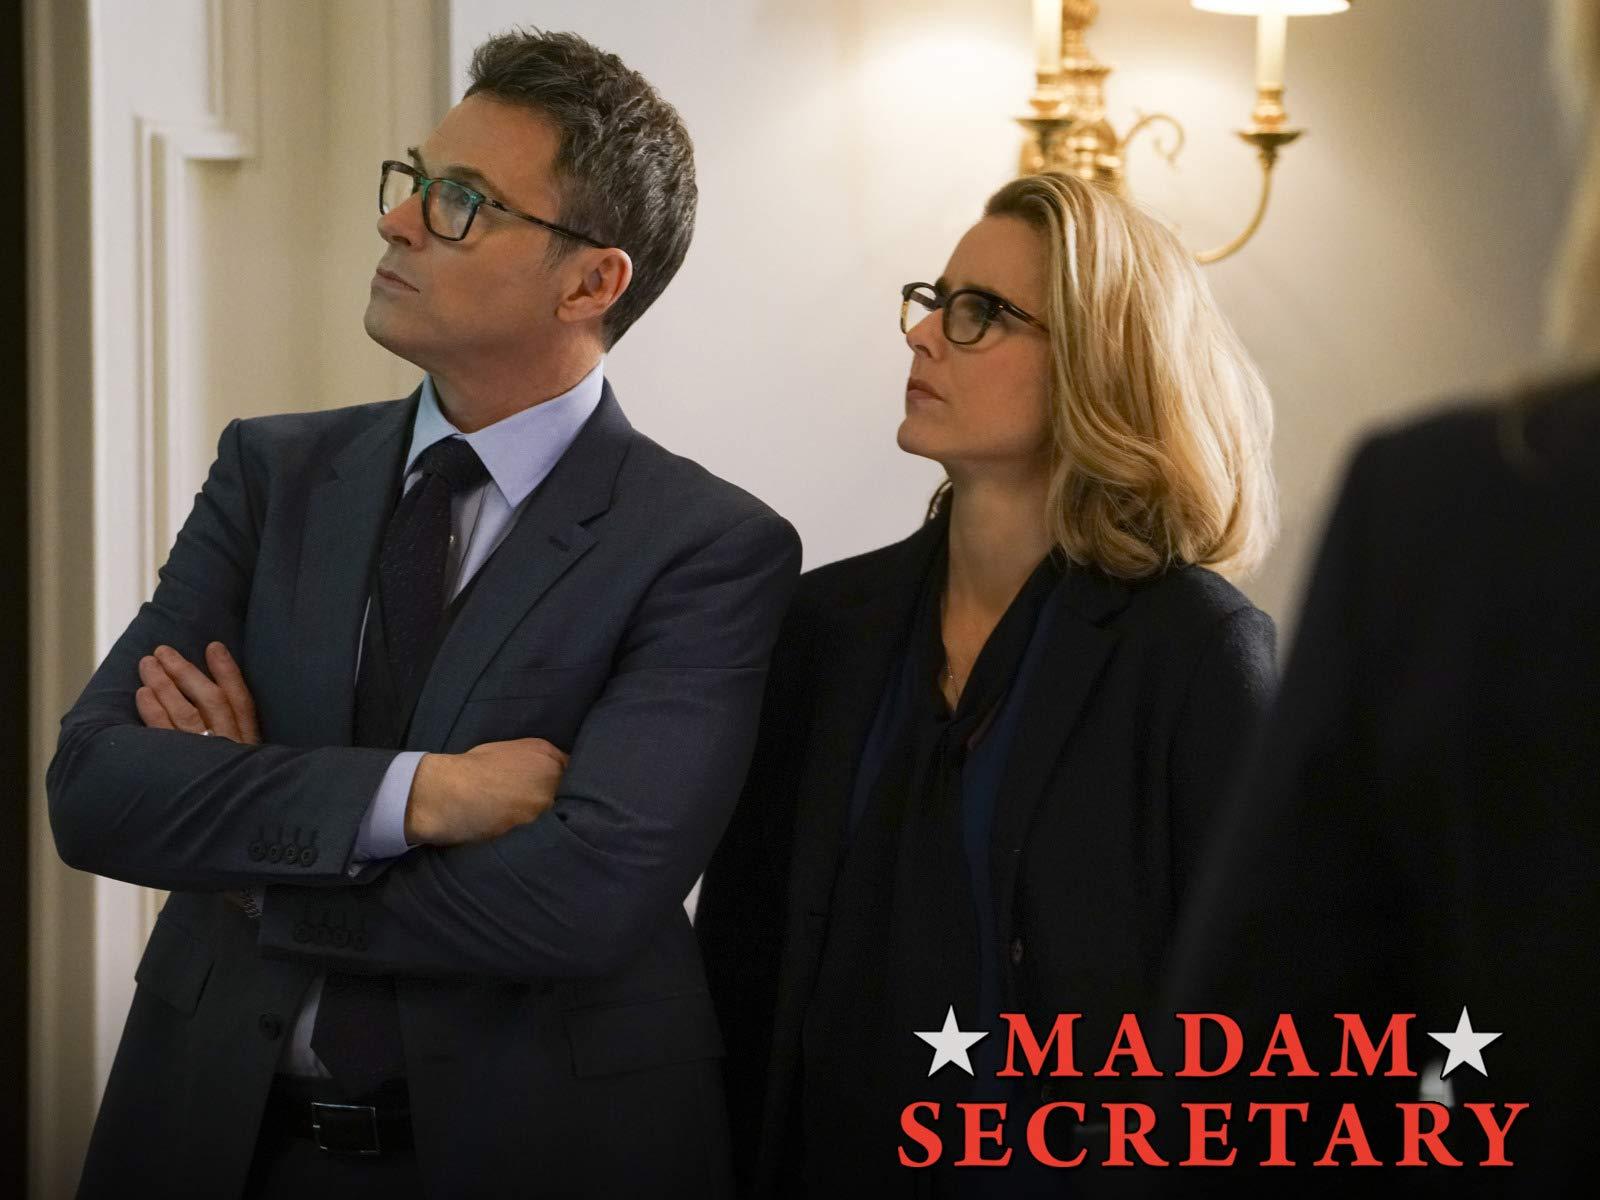 Watch Madam Secretary Season 2 Prime Video